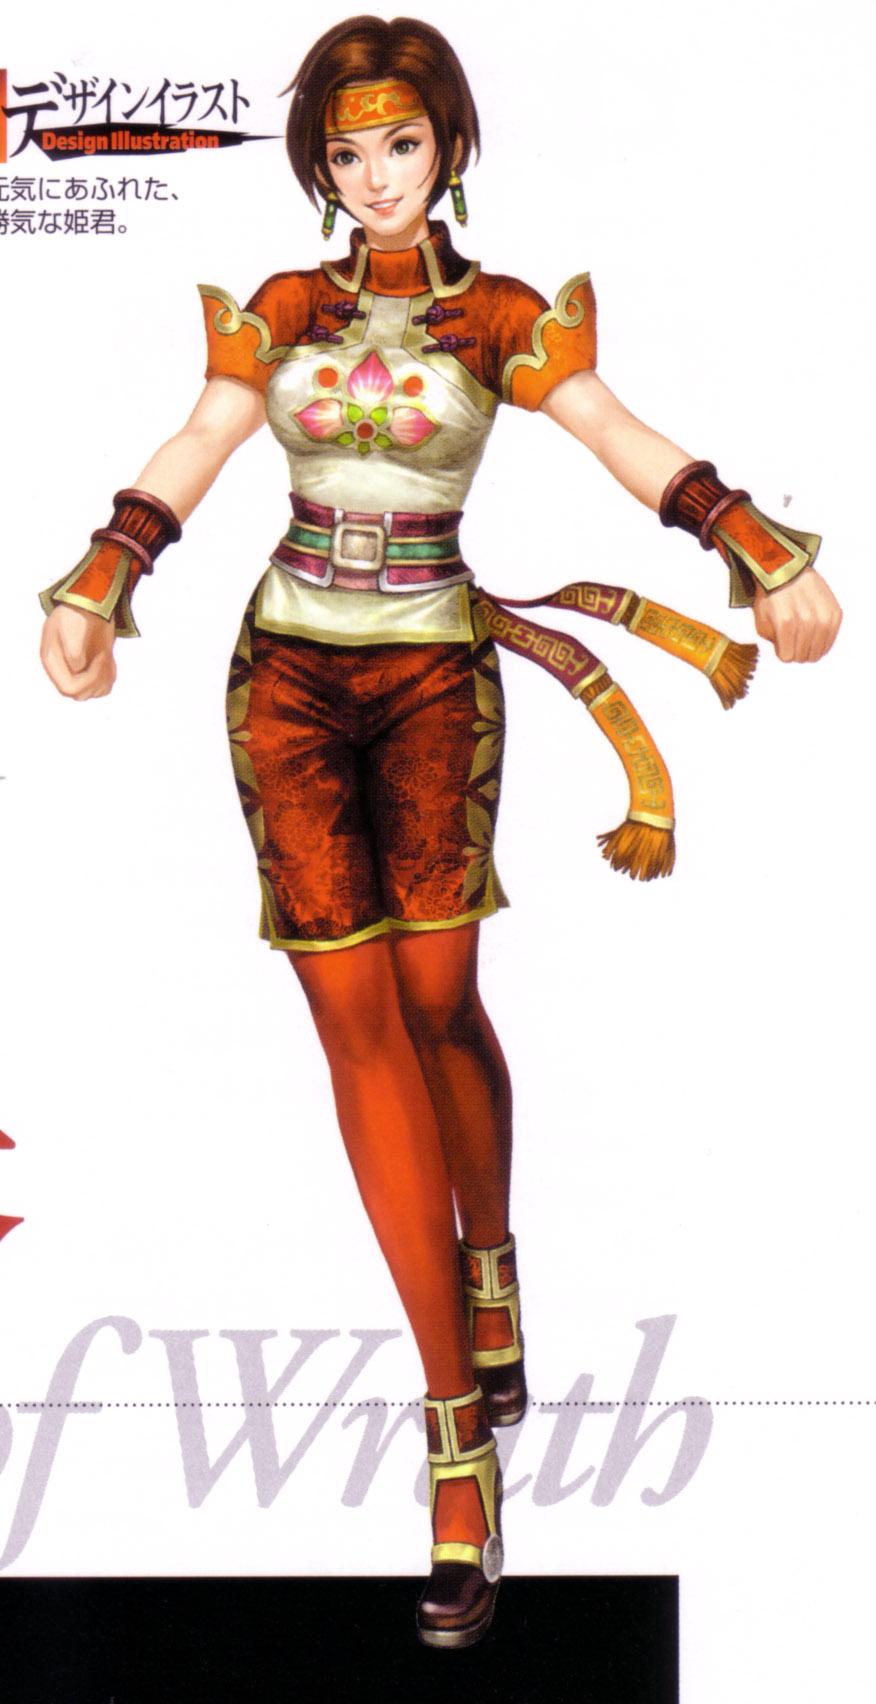 Dynasty Warriors/#464760 - Zerochan